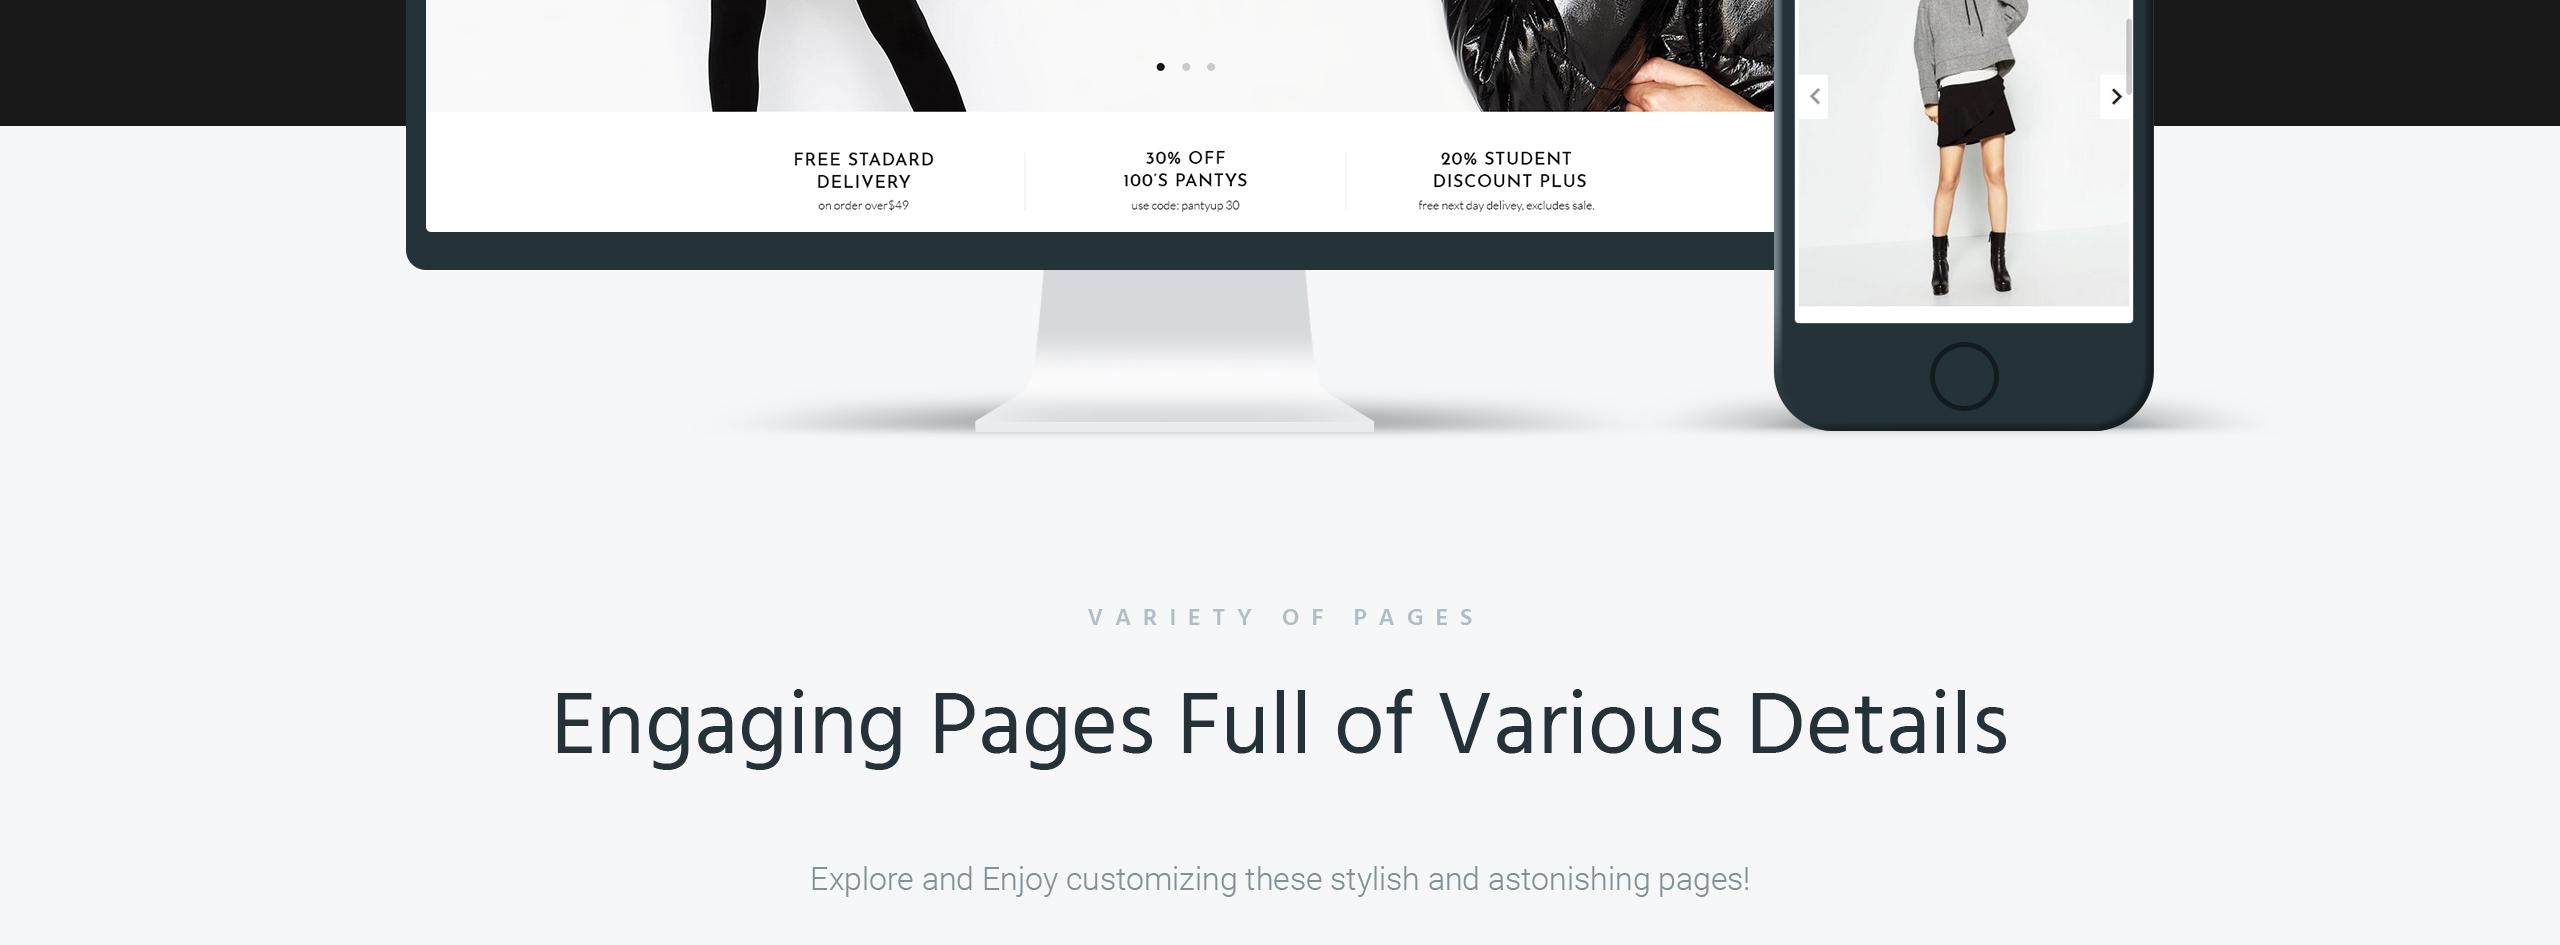 Website Design Template 67288 - portfolio post gallery shopping premium promotion responsive testimonials creative design